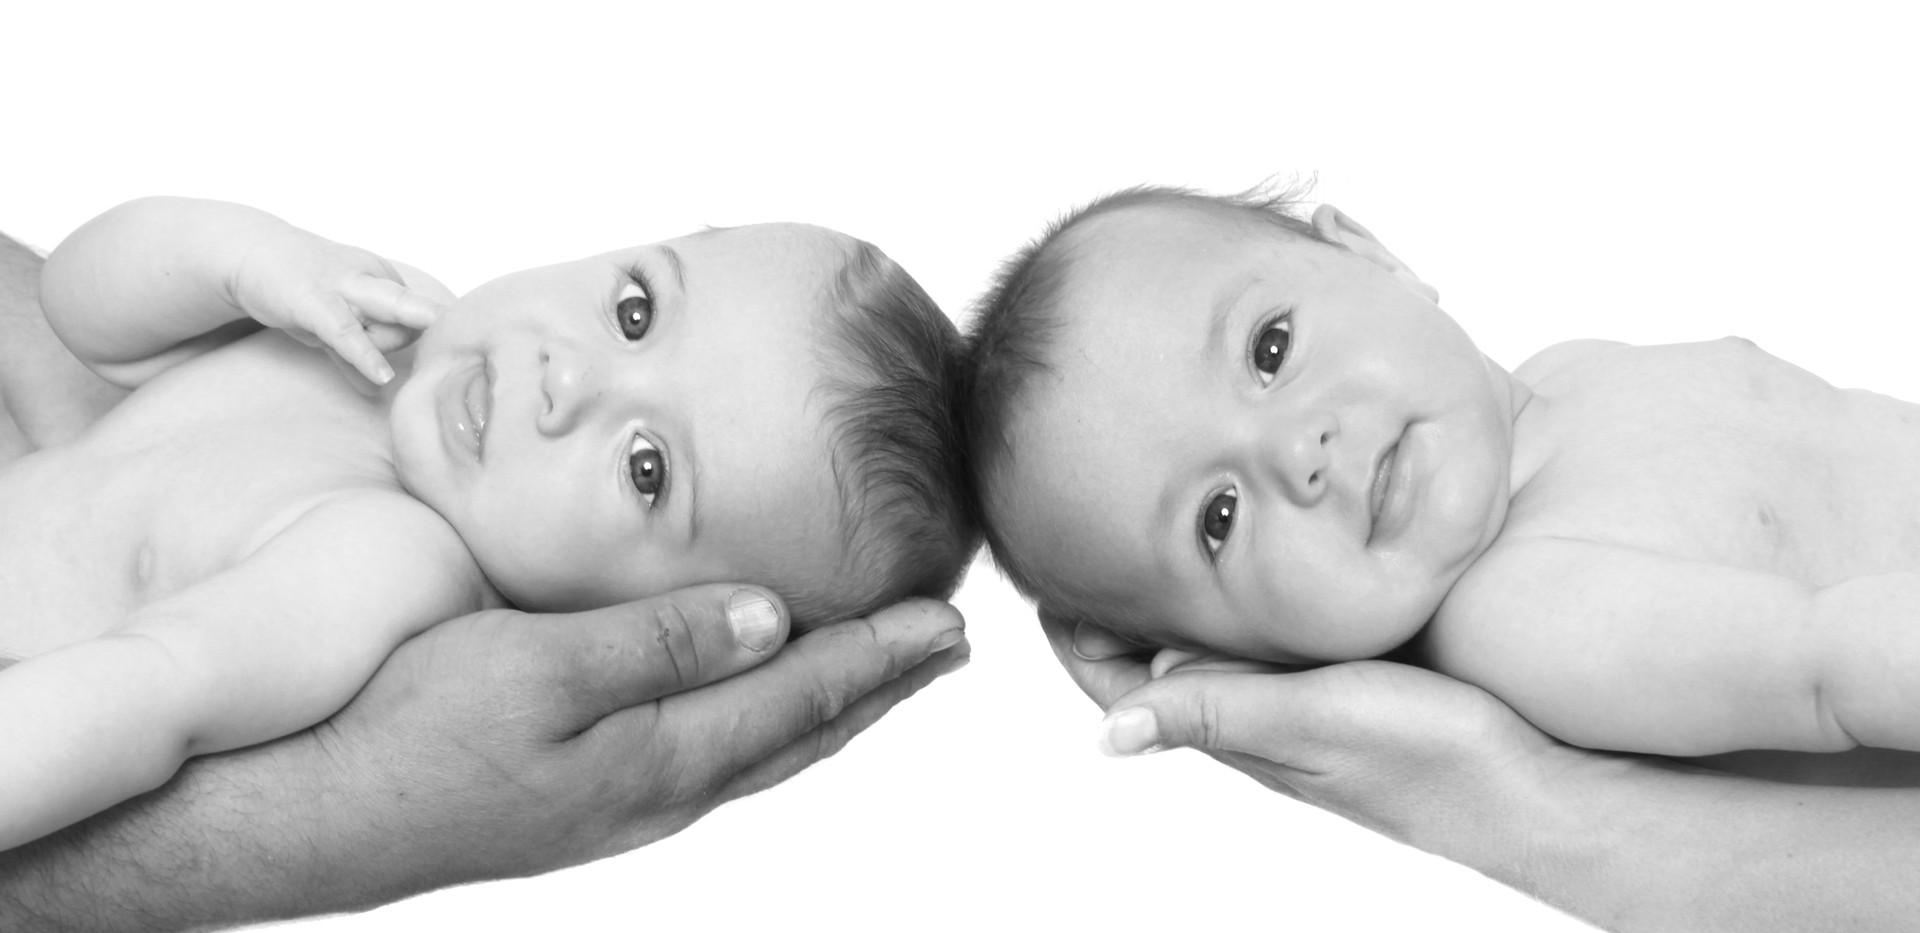 The Vandries Twins